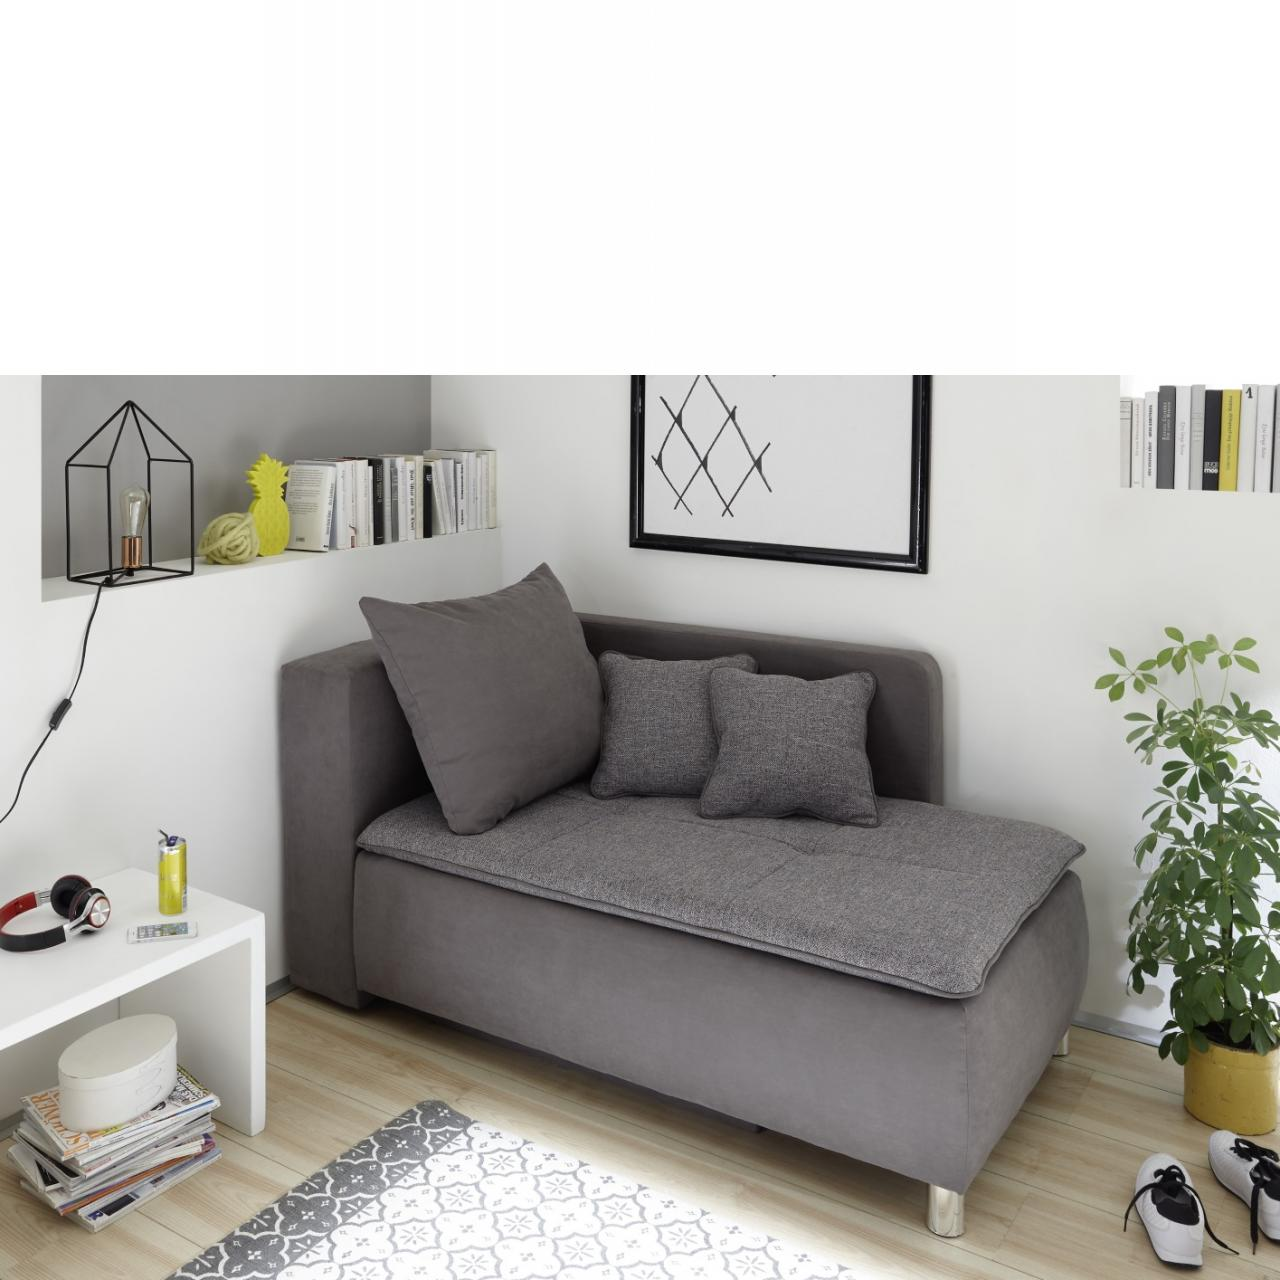 Sofa Marilyn Grau Mit Funktion Liege Polstermöbel Möbel